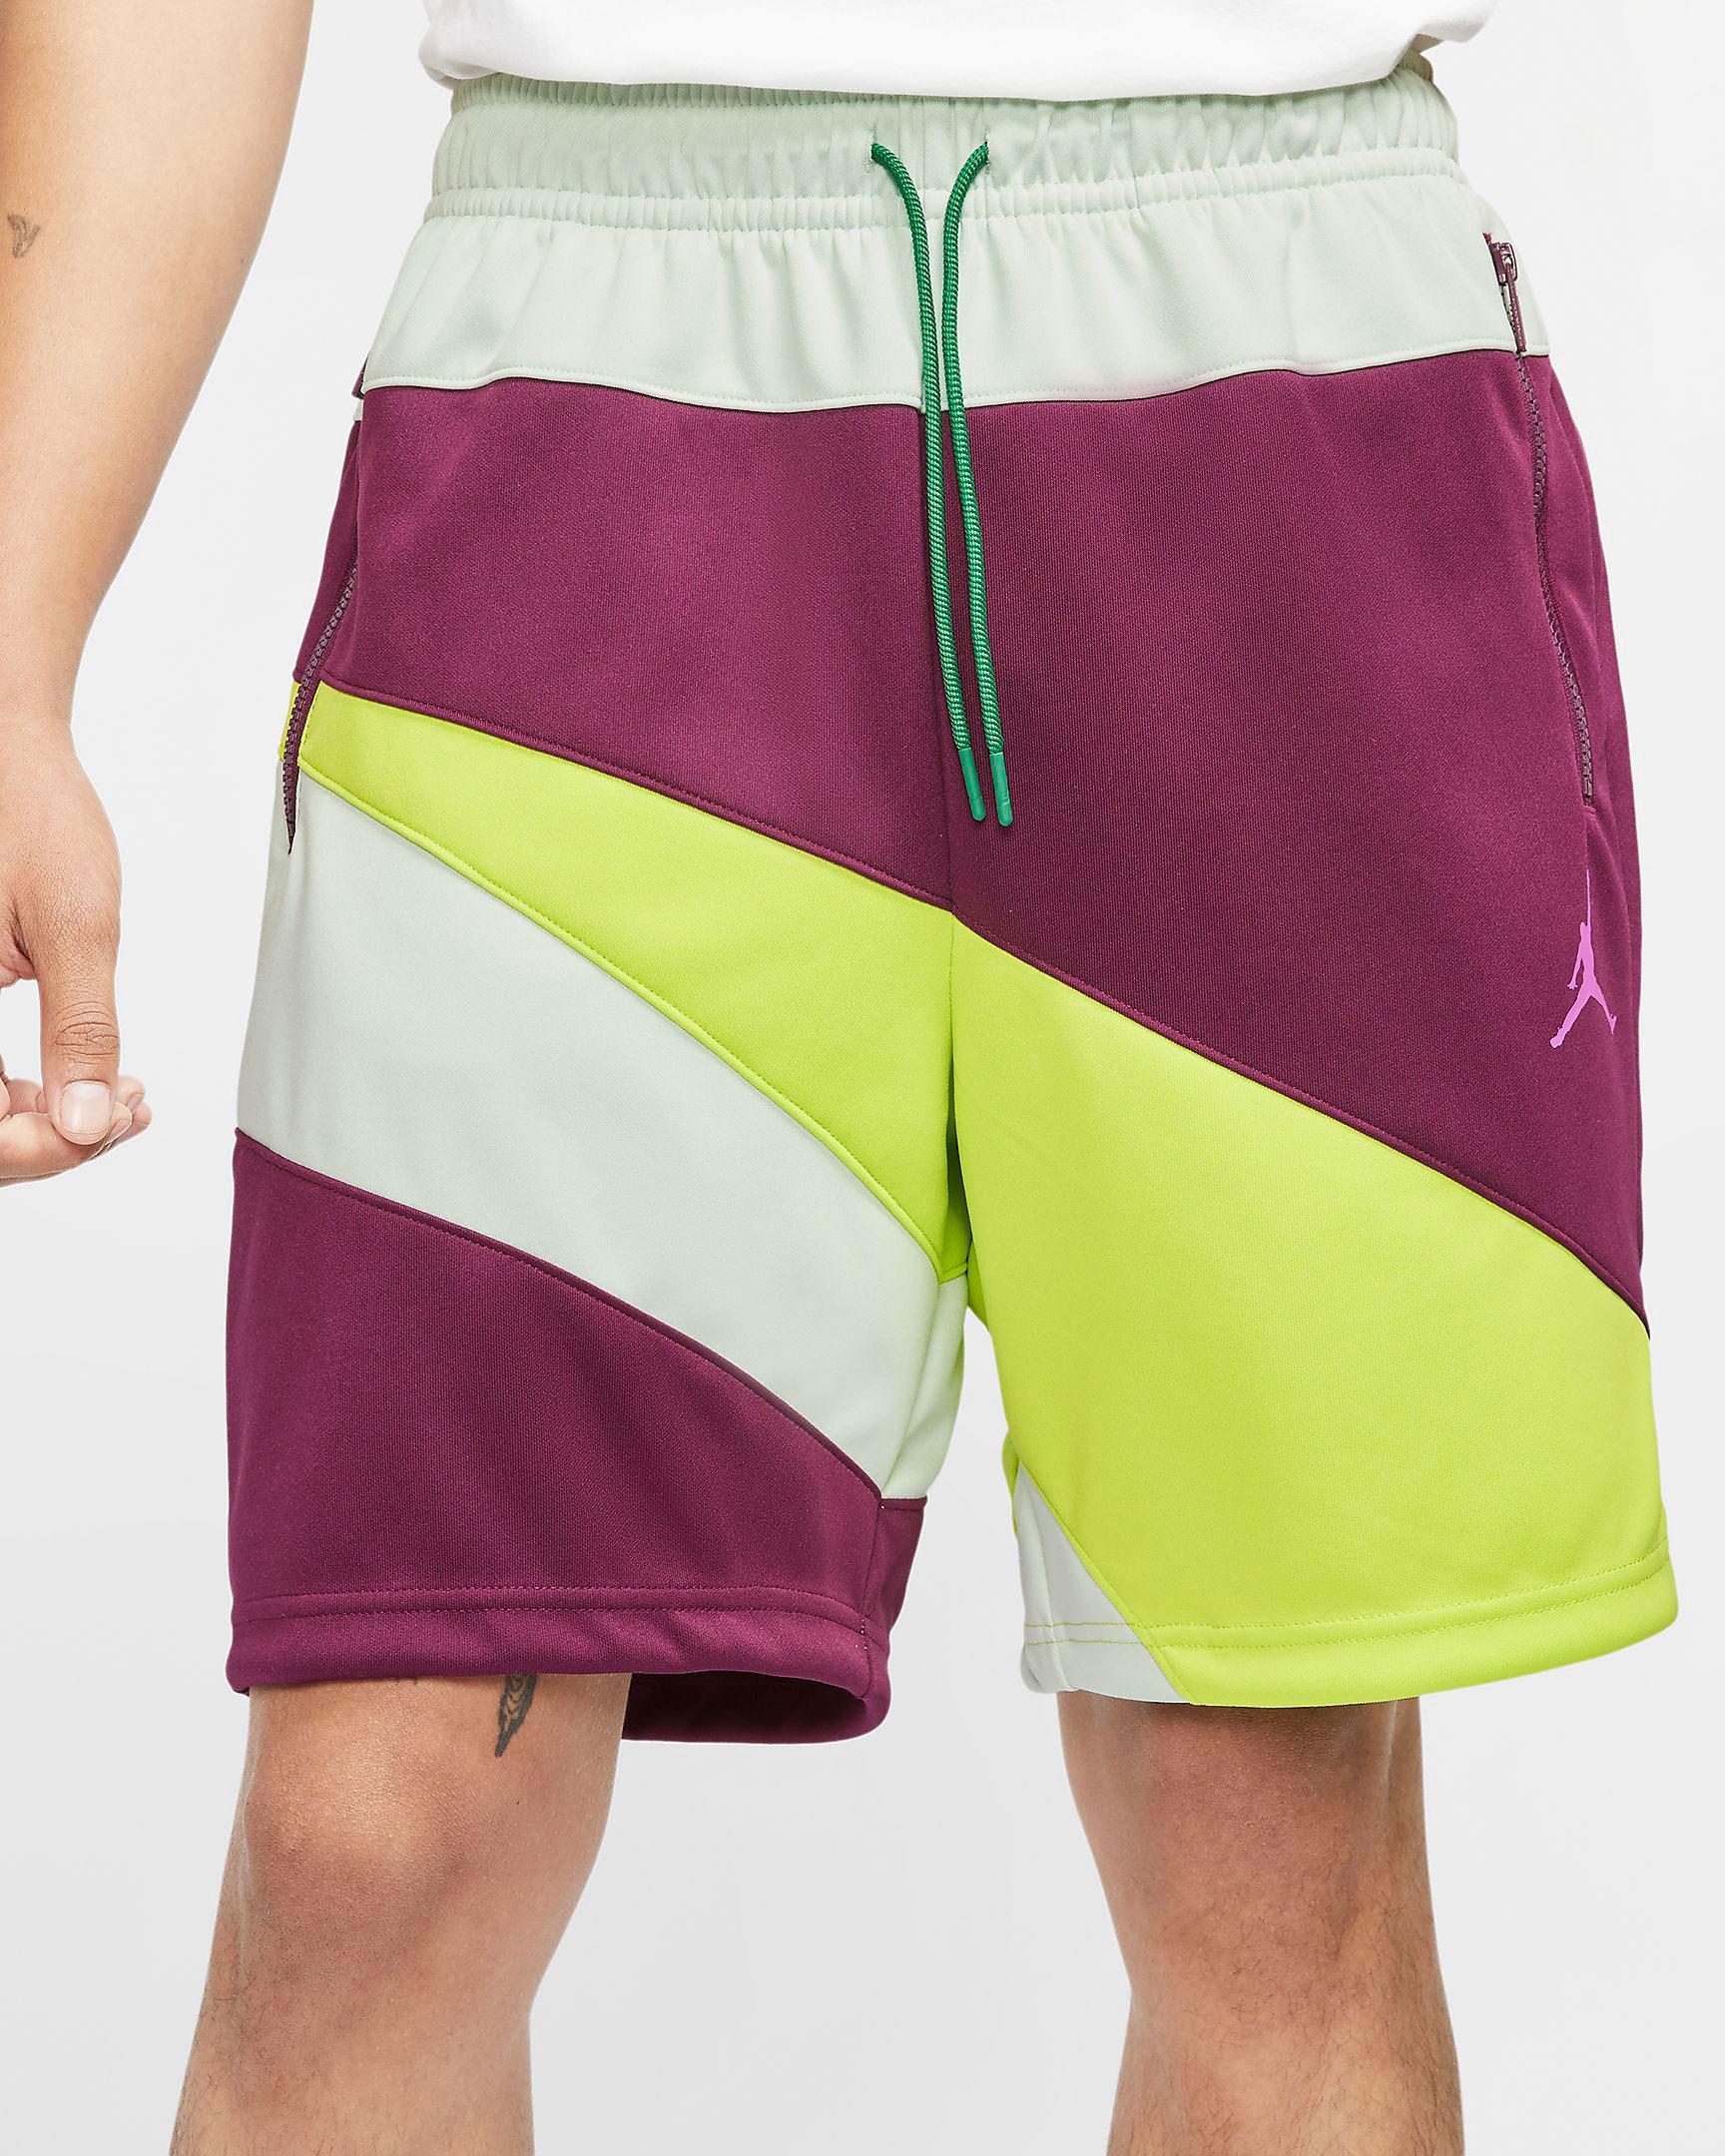 jordan-wave-shorts-bordeaux-fuchsia-cyber